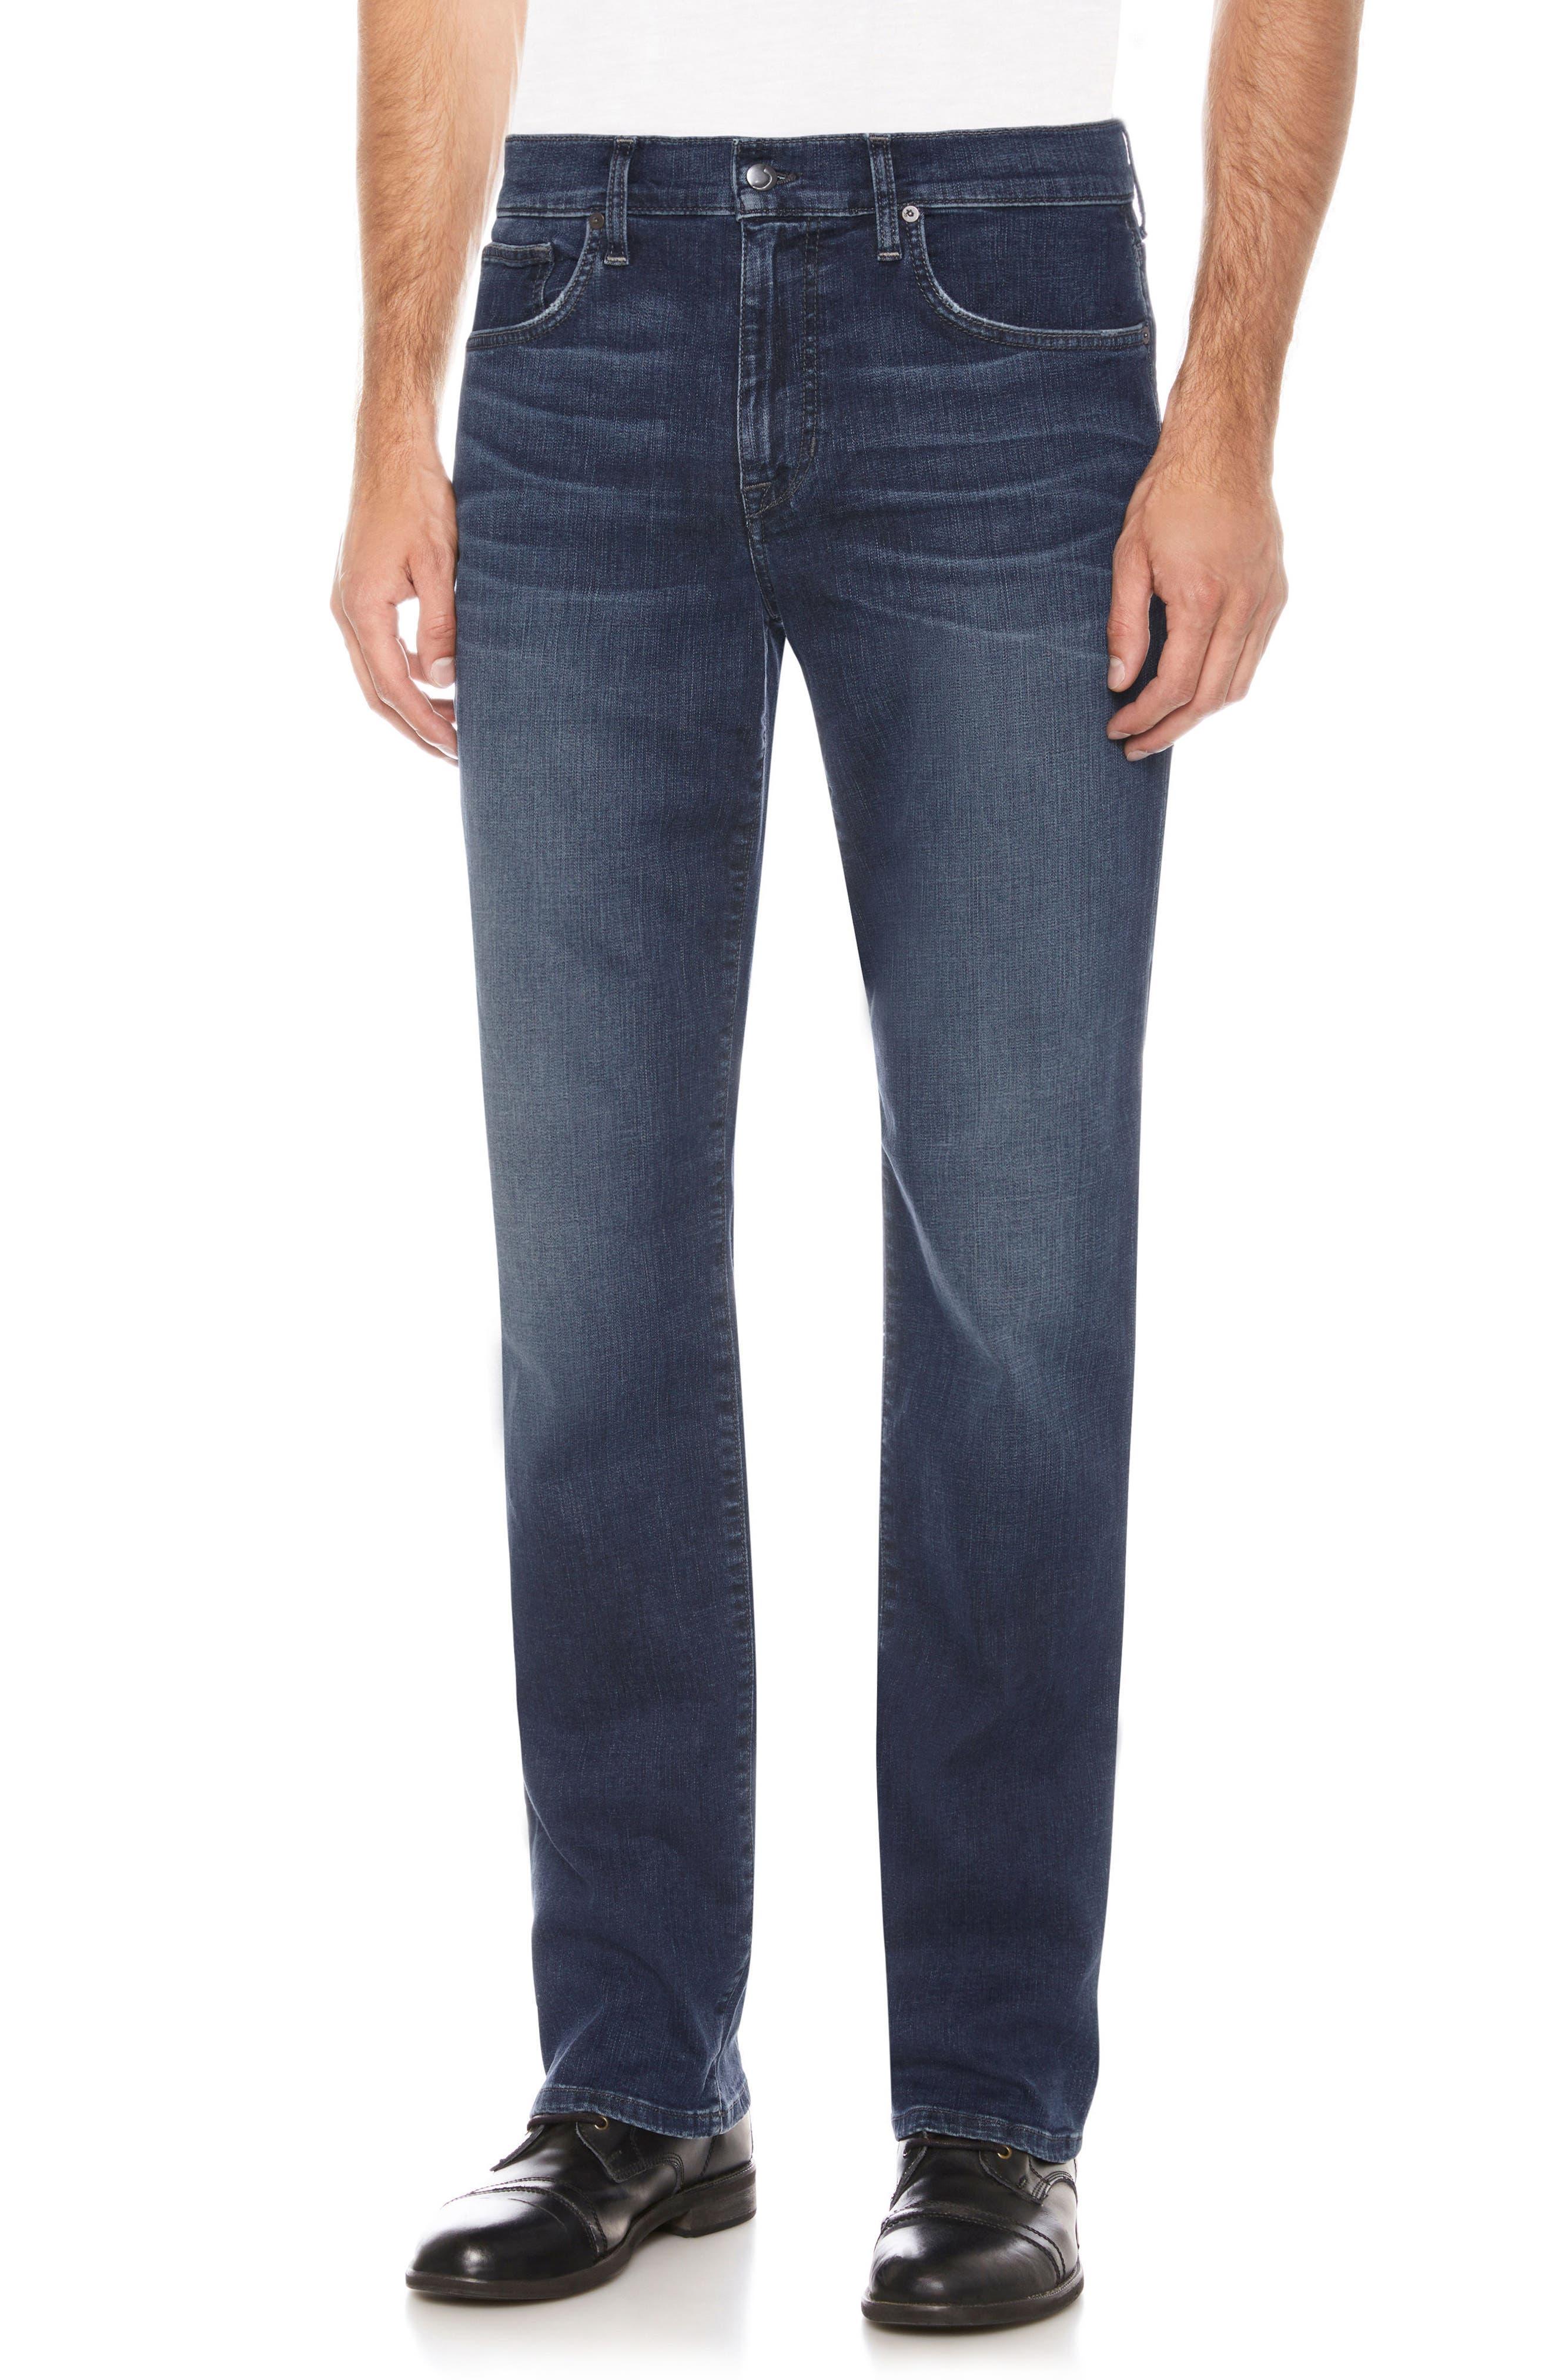 JOE'S,                             Classic Straight Fit Jeans,                             Main thumbnail 1, color,                             400